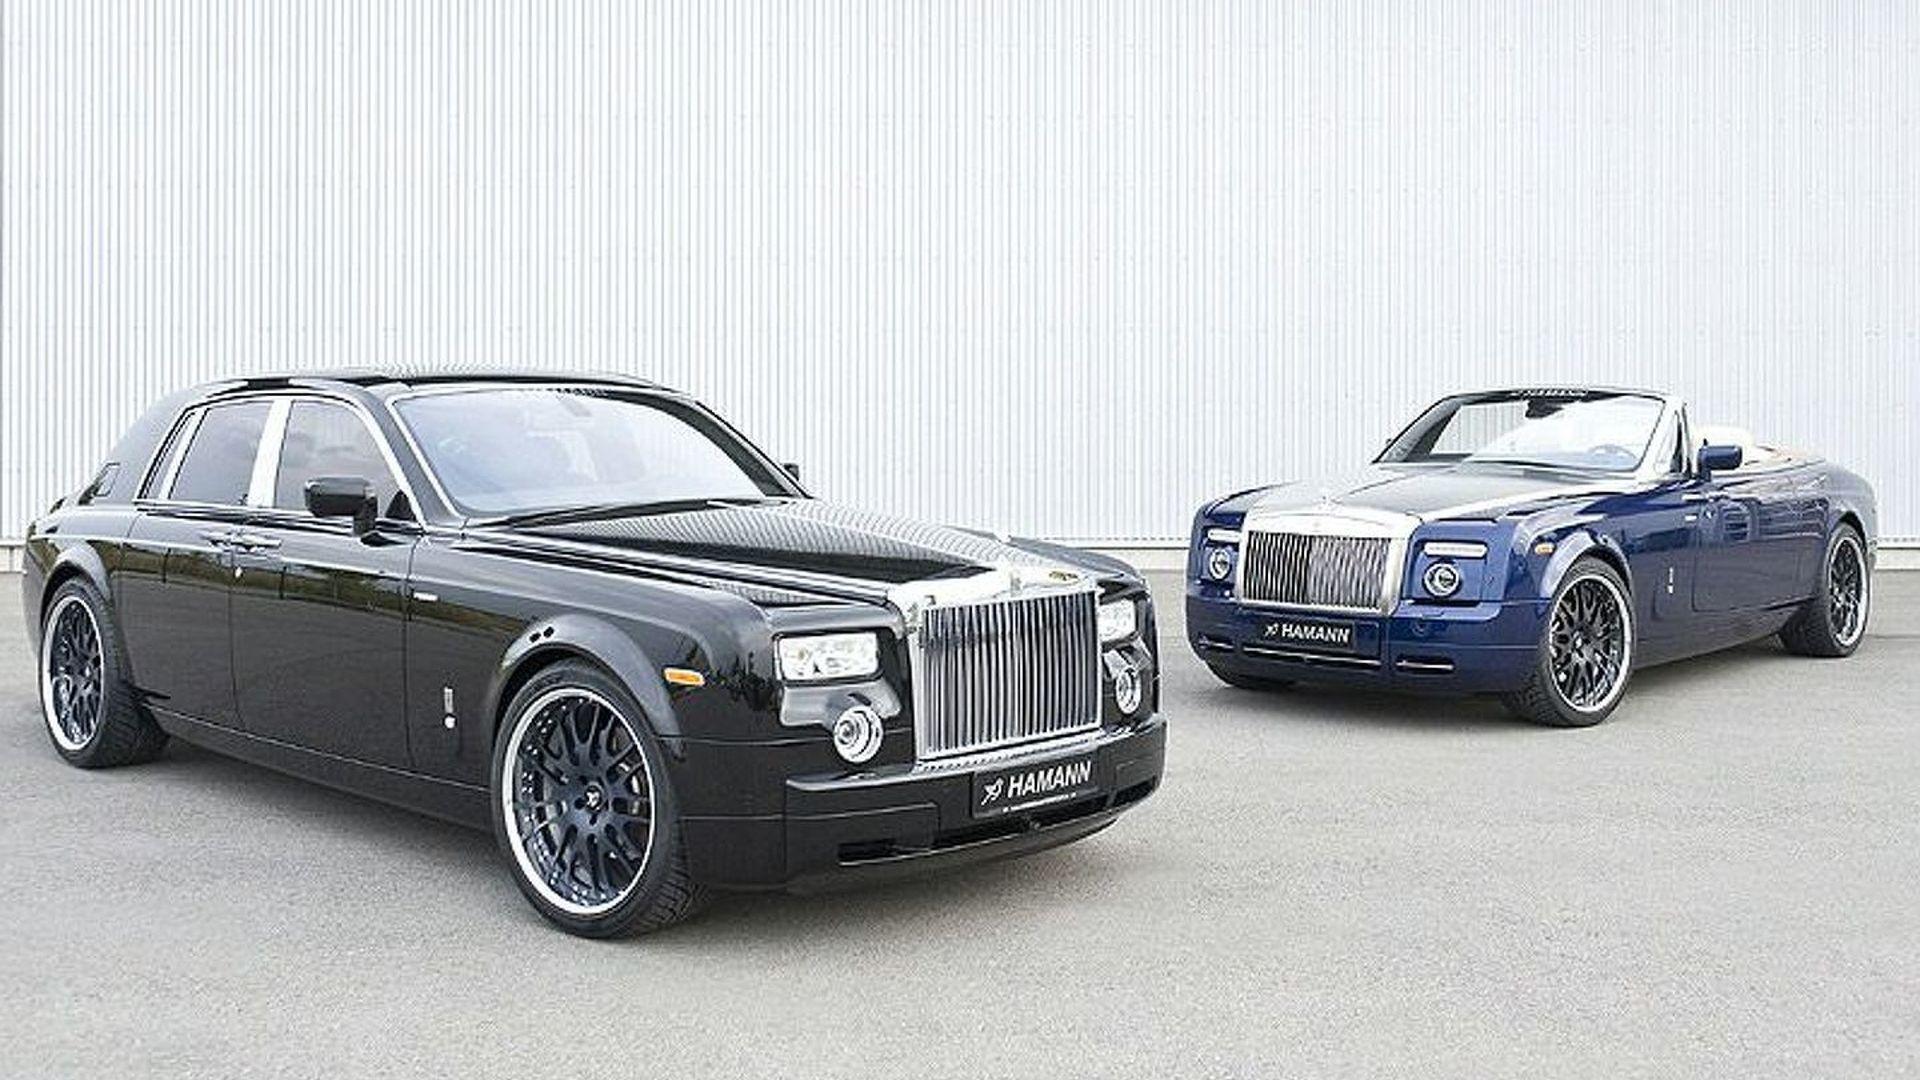 Hamann Rolls Royce Phantom Images Surface